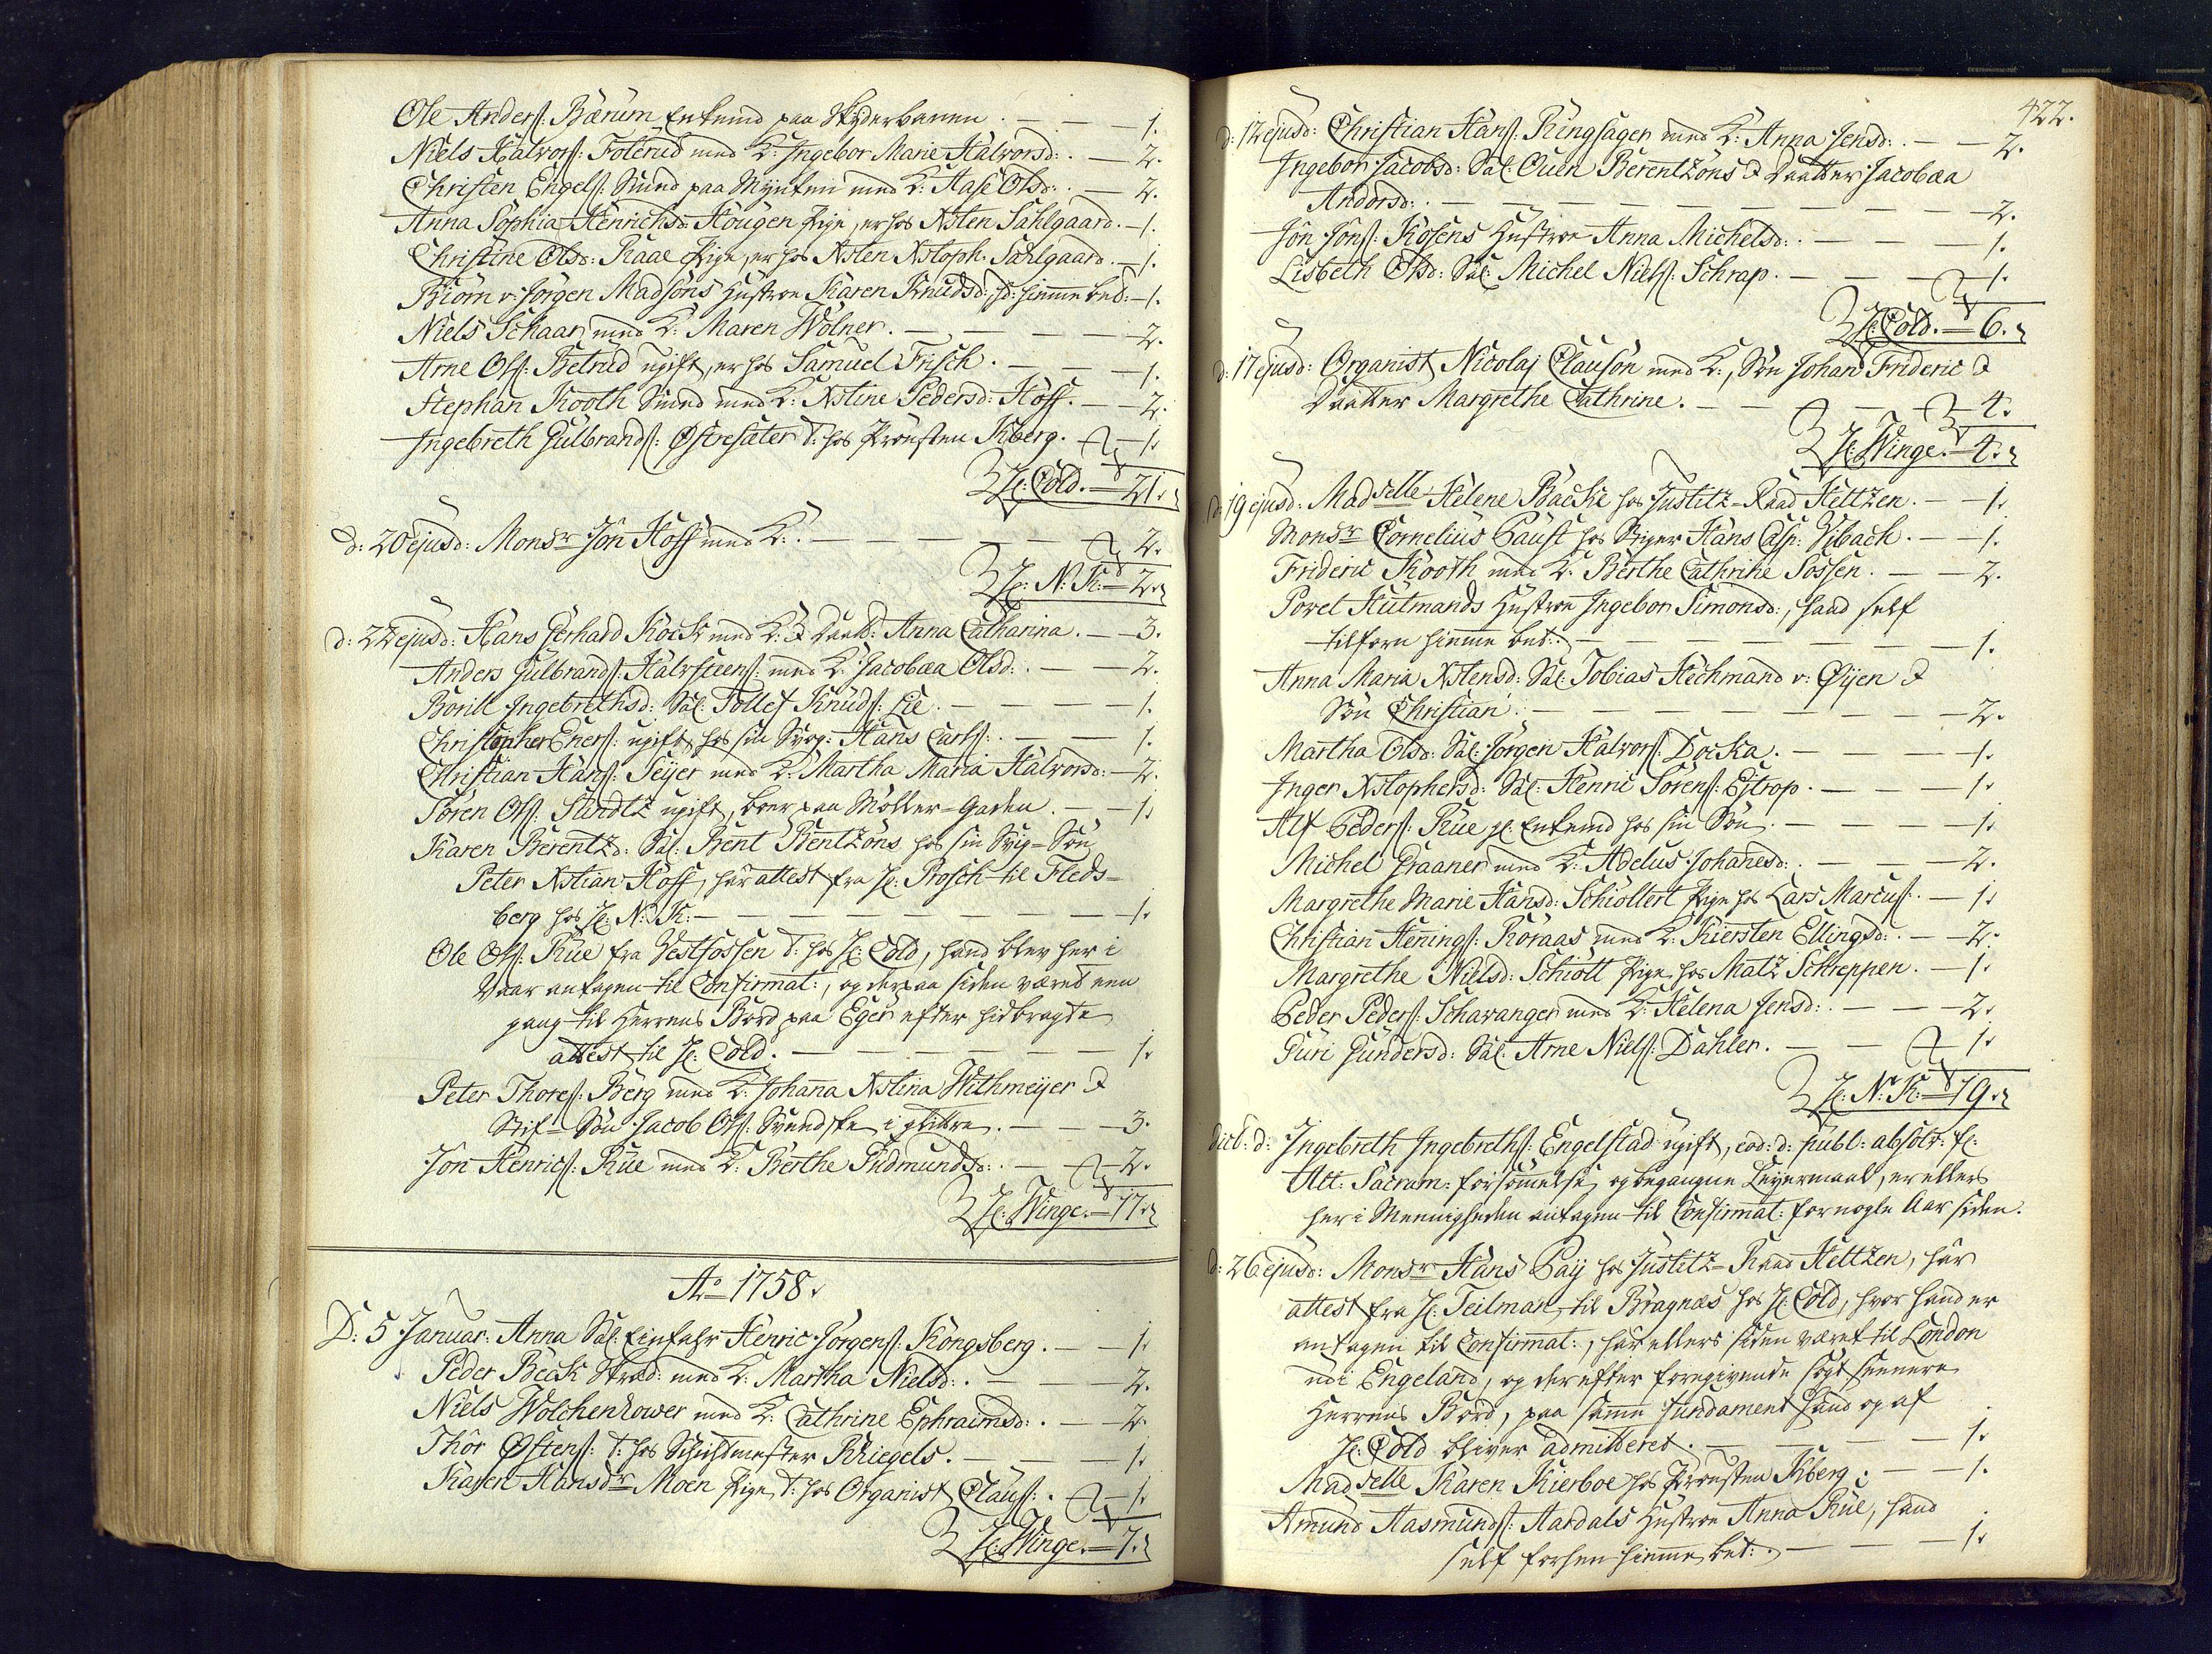 SAKO, Kongsberg kirkebøker, M/Ma/L0005: Kommunikantprotokoll nr. 5, 1755-1761, s. 422